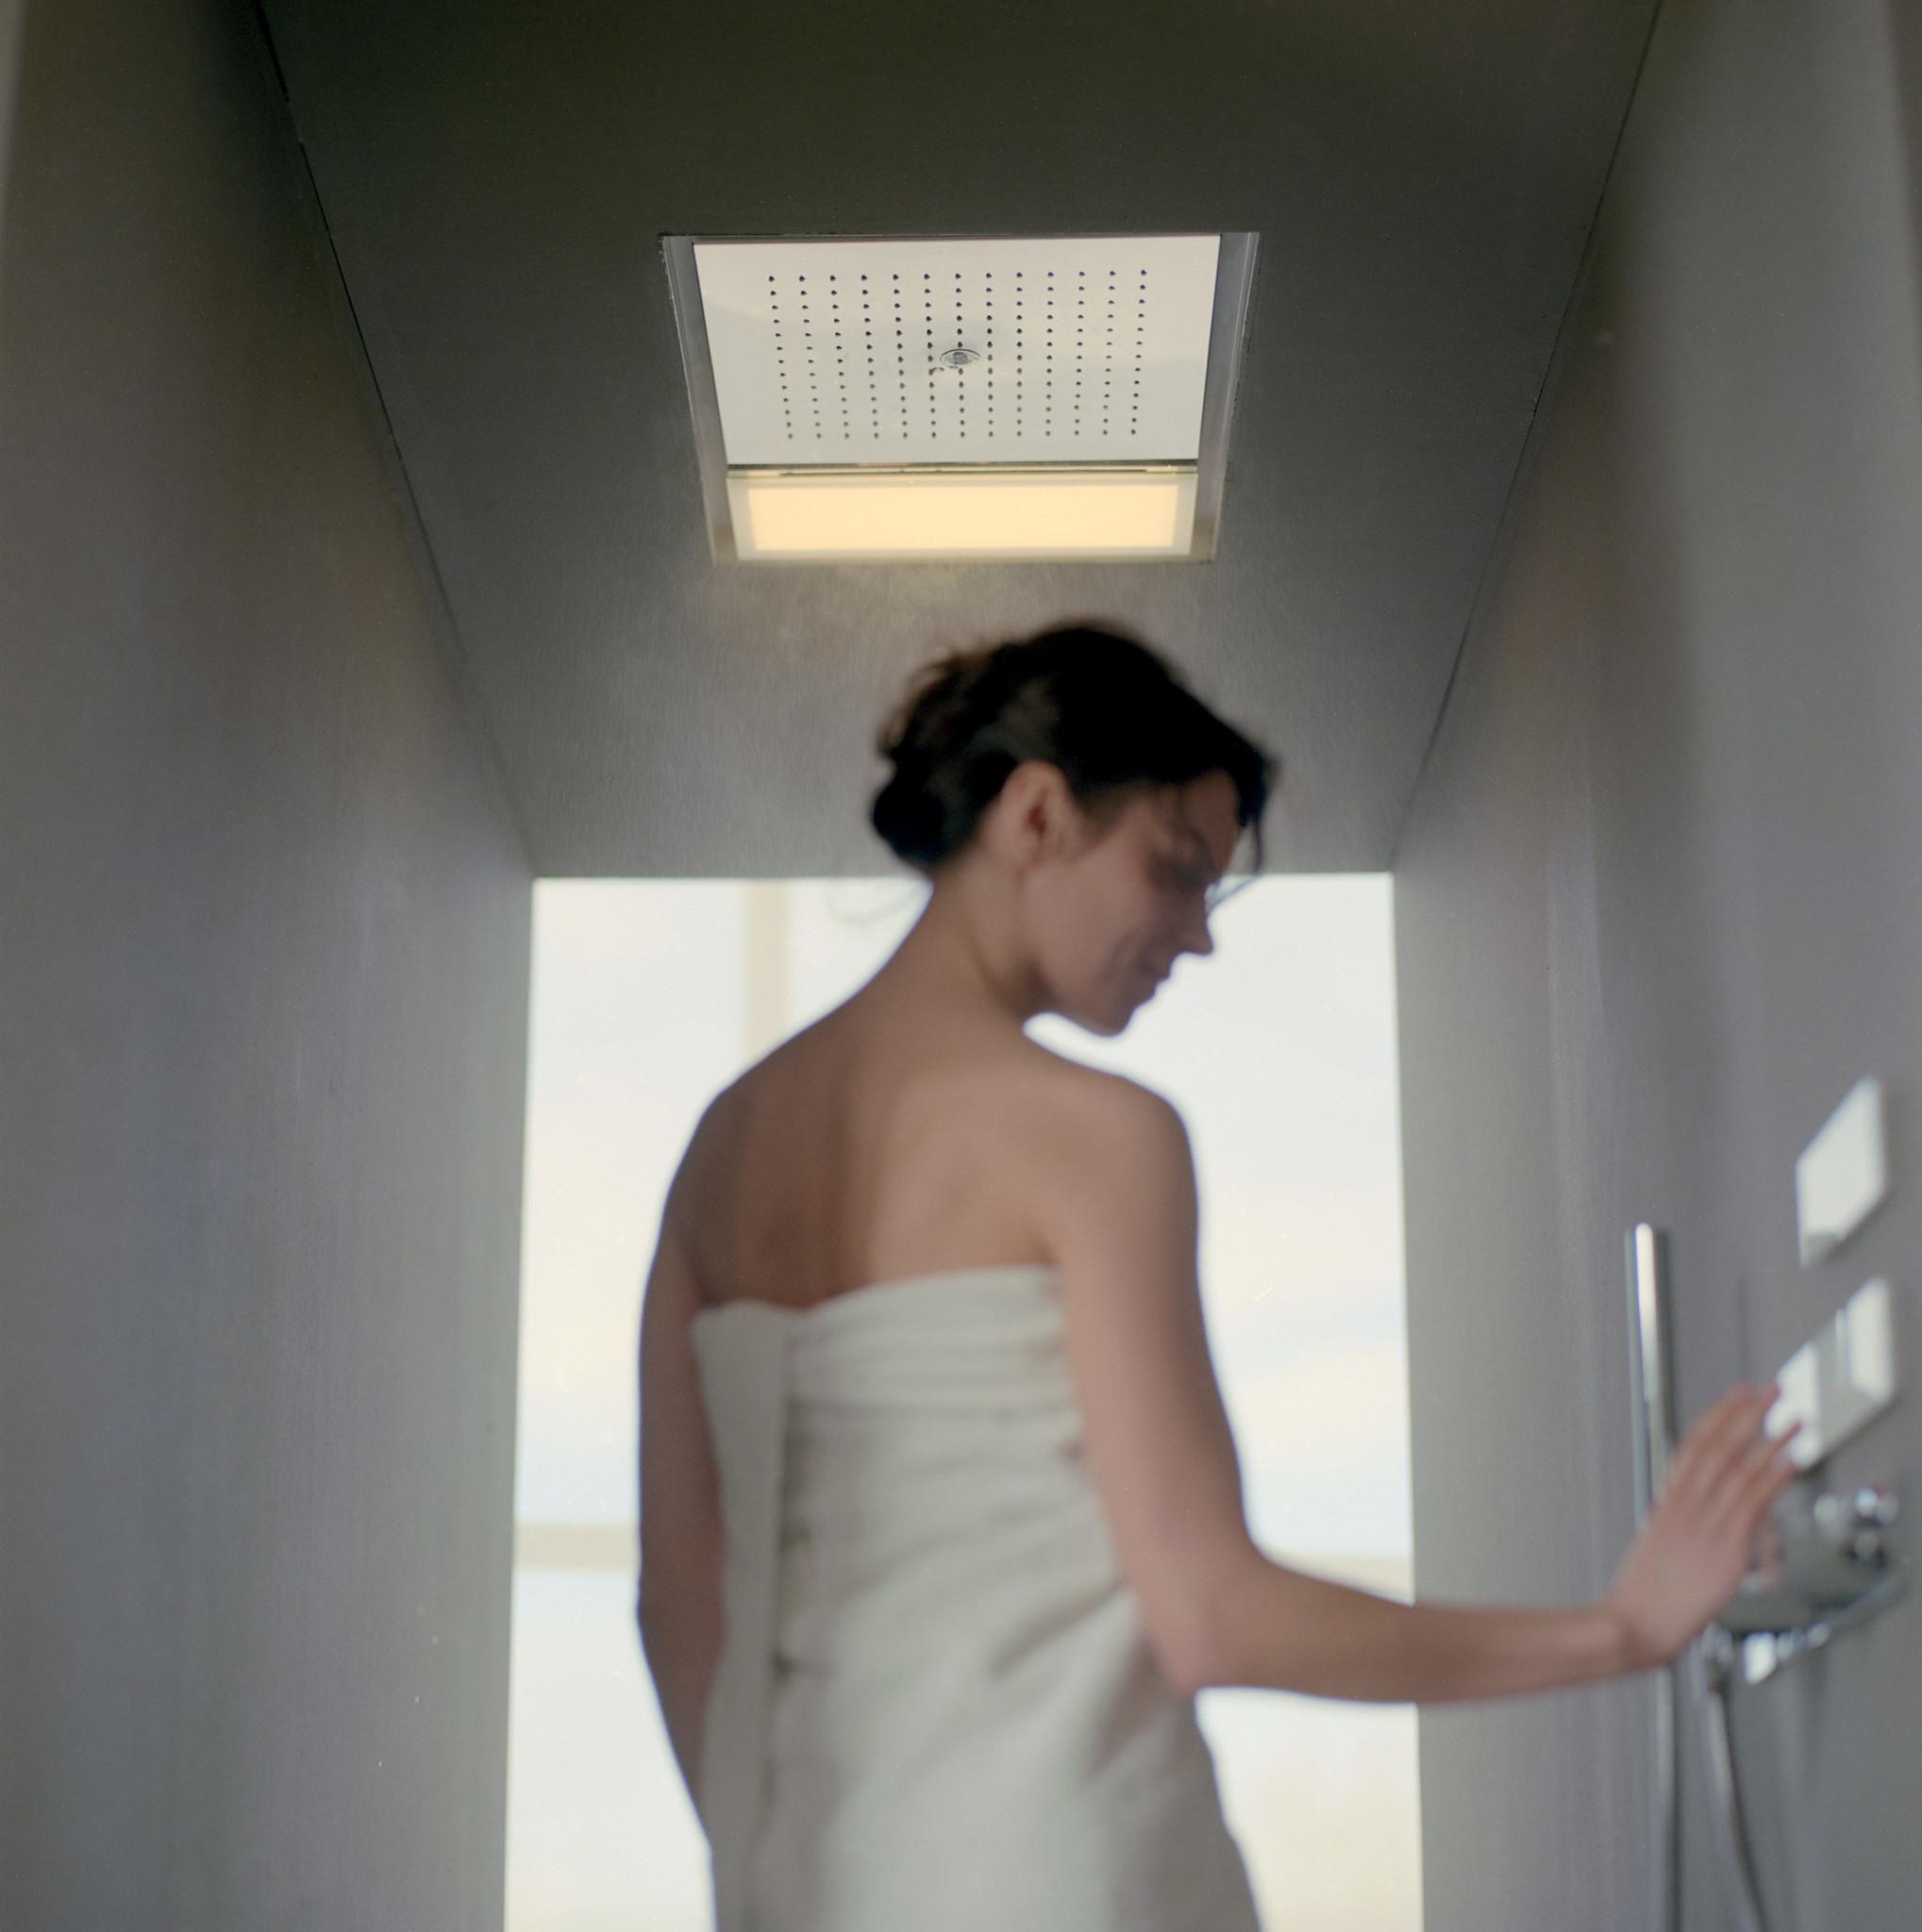 Sistema doccia FeelGood - Effegibi